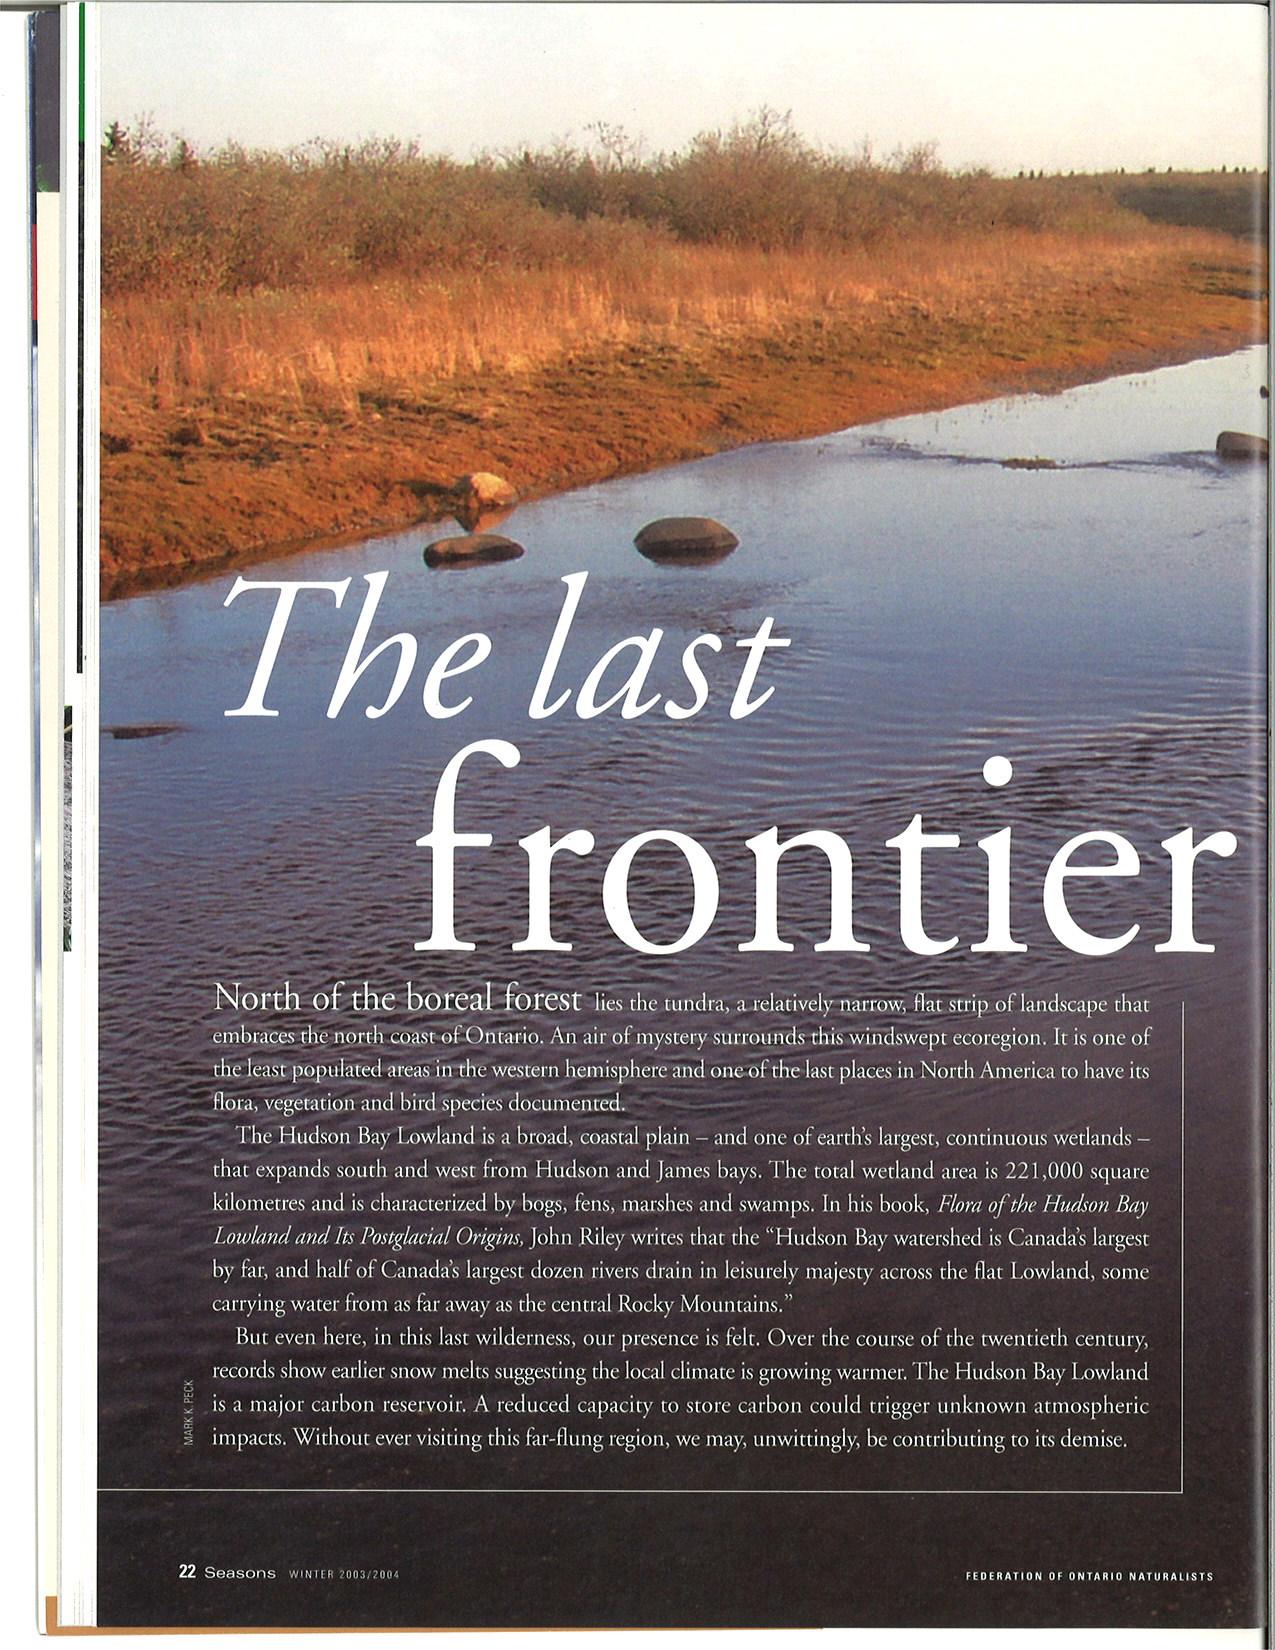 seasons_2003_v43_i4_the_last_frontier_22